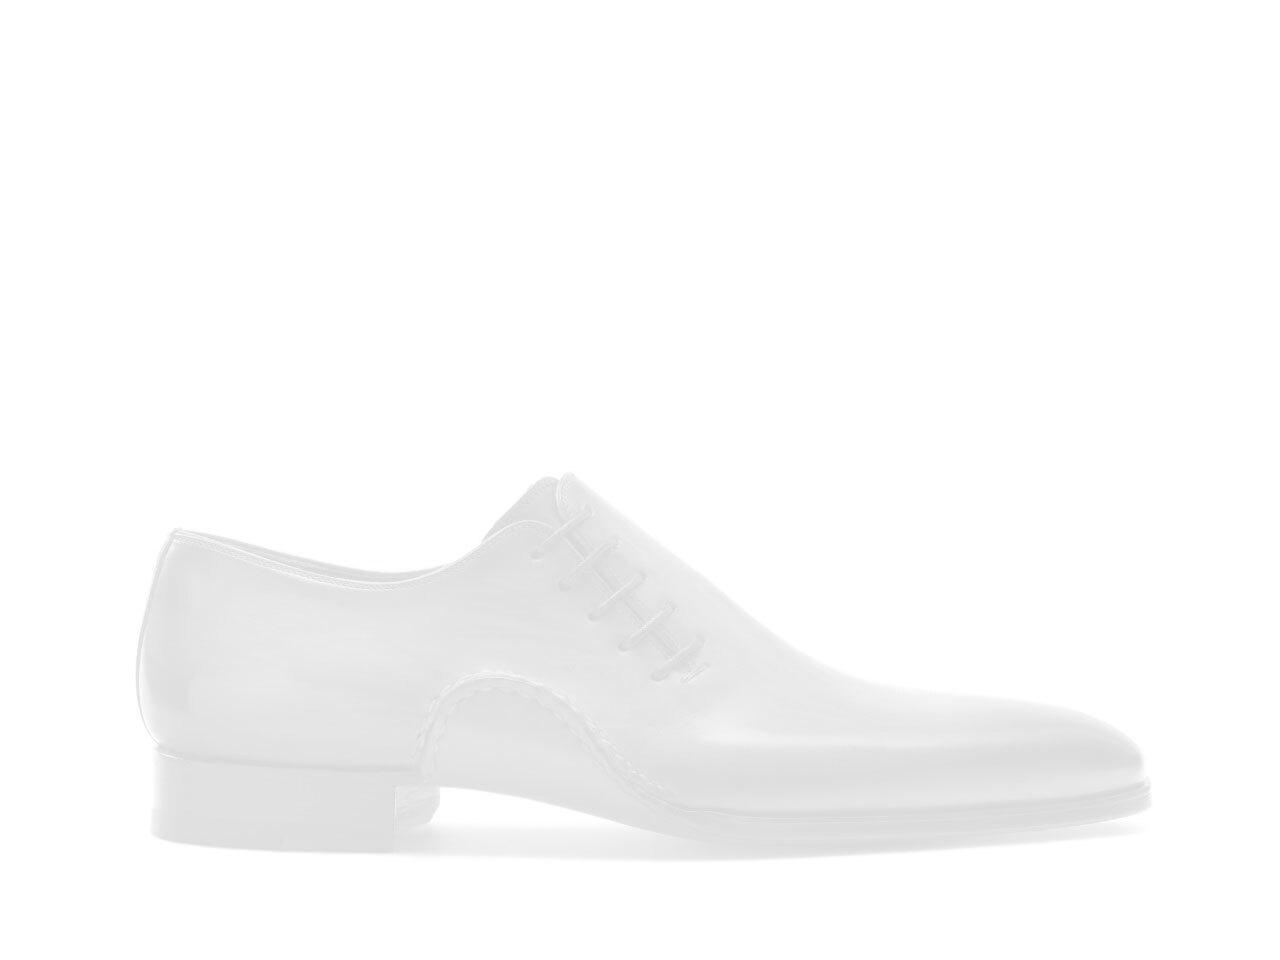 Sole of the Magnanni Belago II Cuero Men's Oxford Shoes